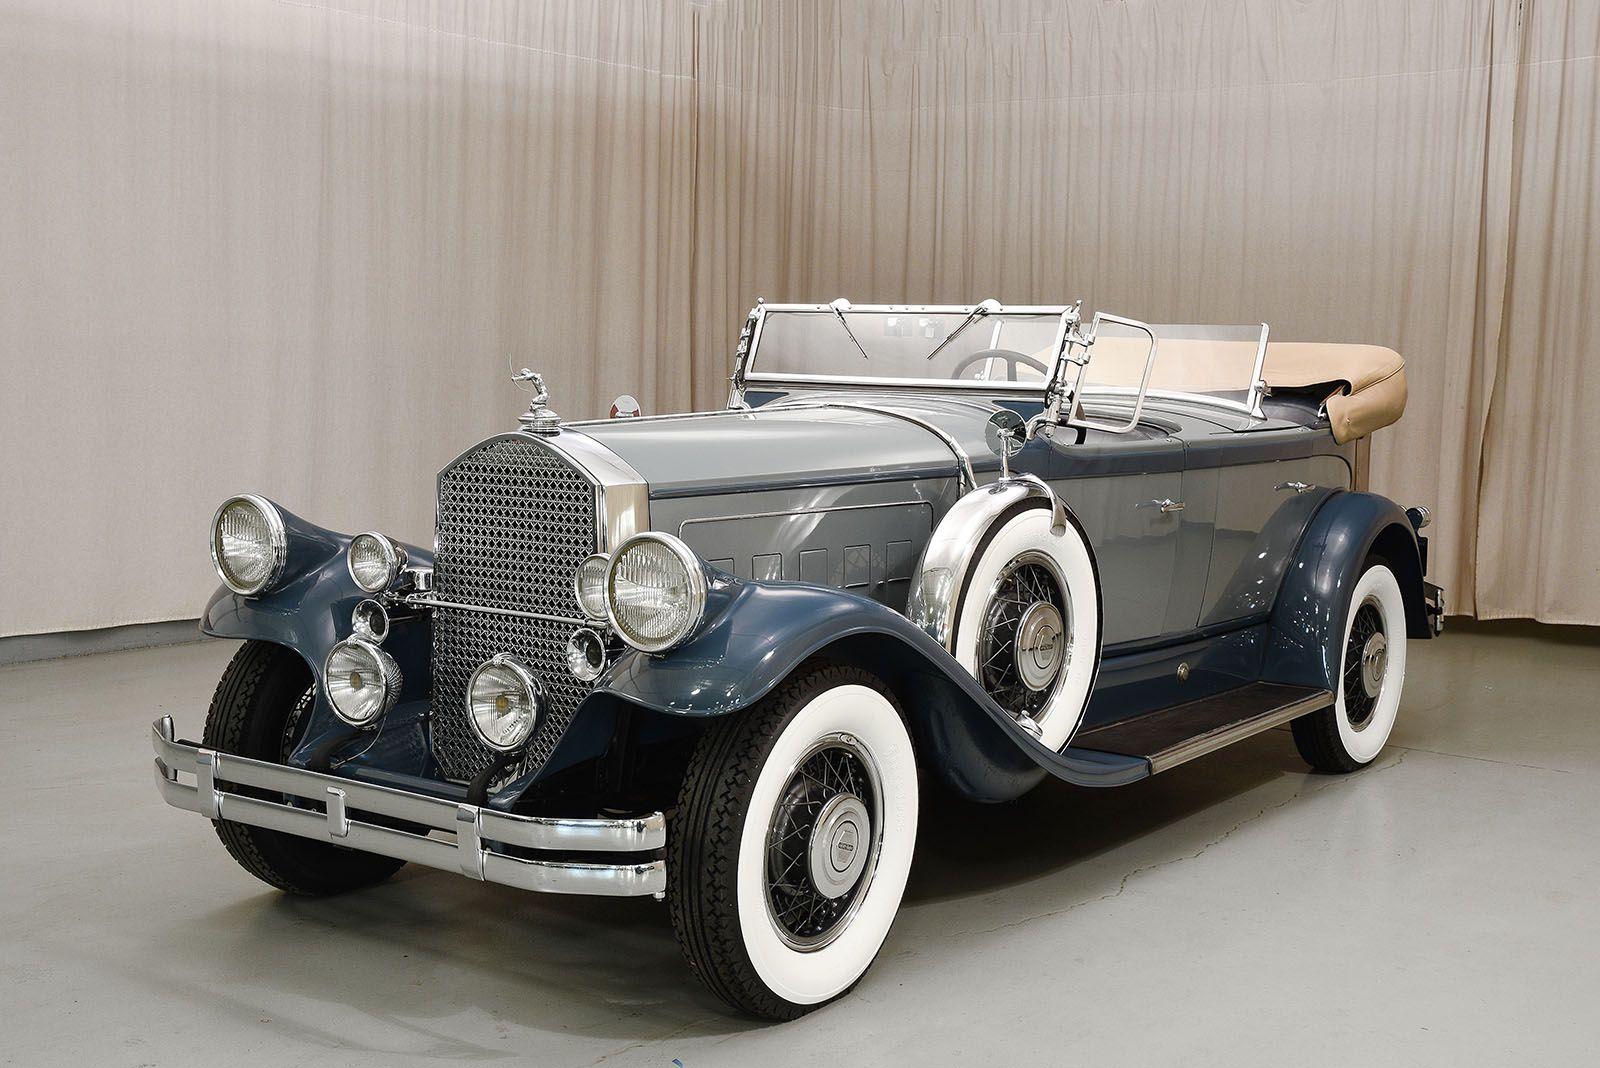 1930 Pierce Arrow Model B - Hyman Ltd. Classic Cars | Автоамерика ...